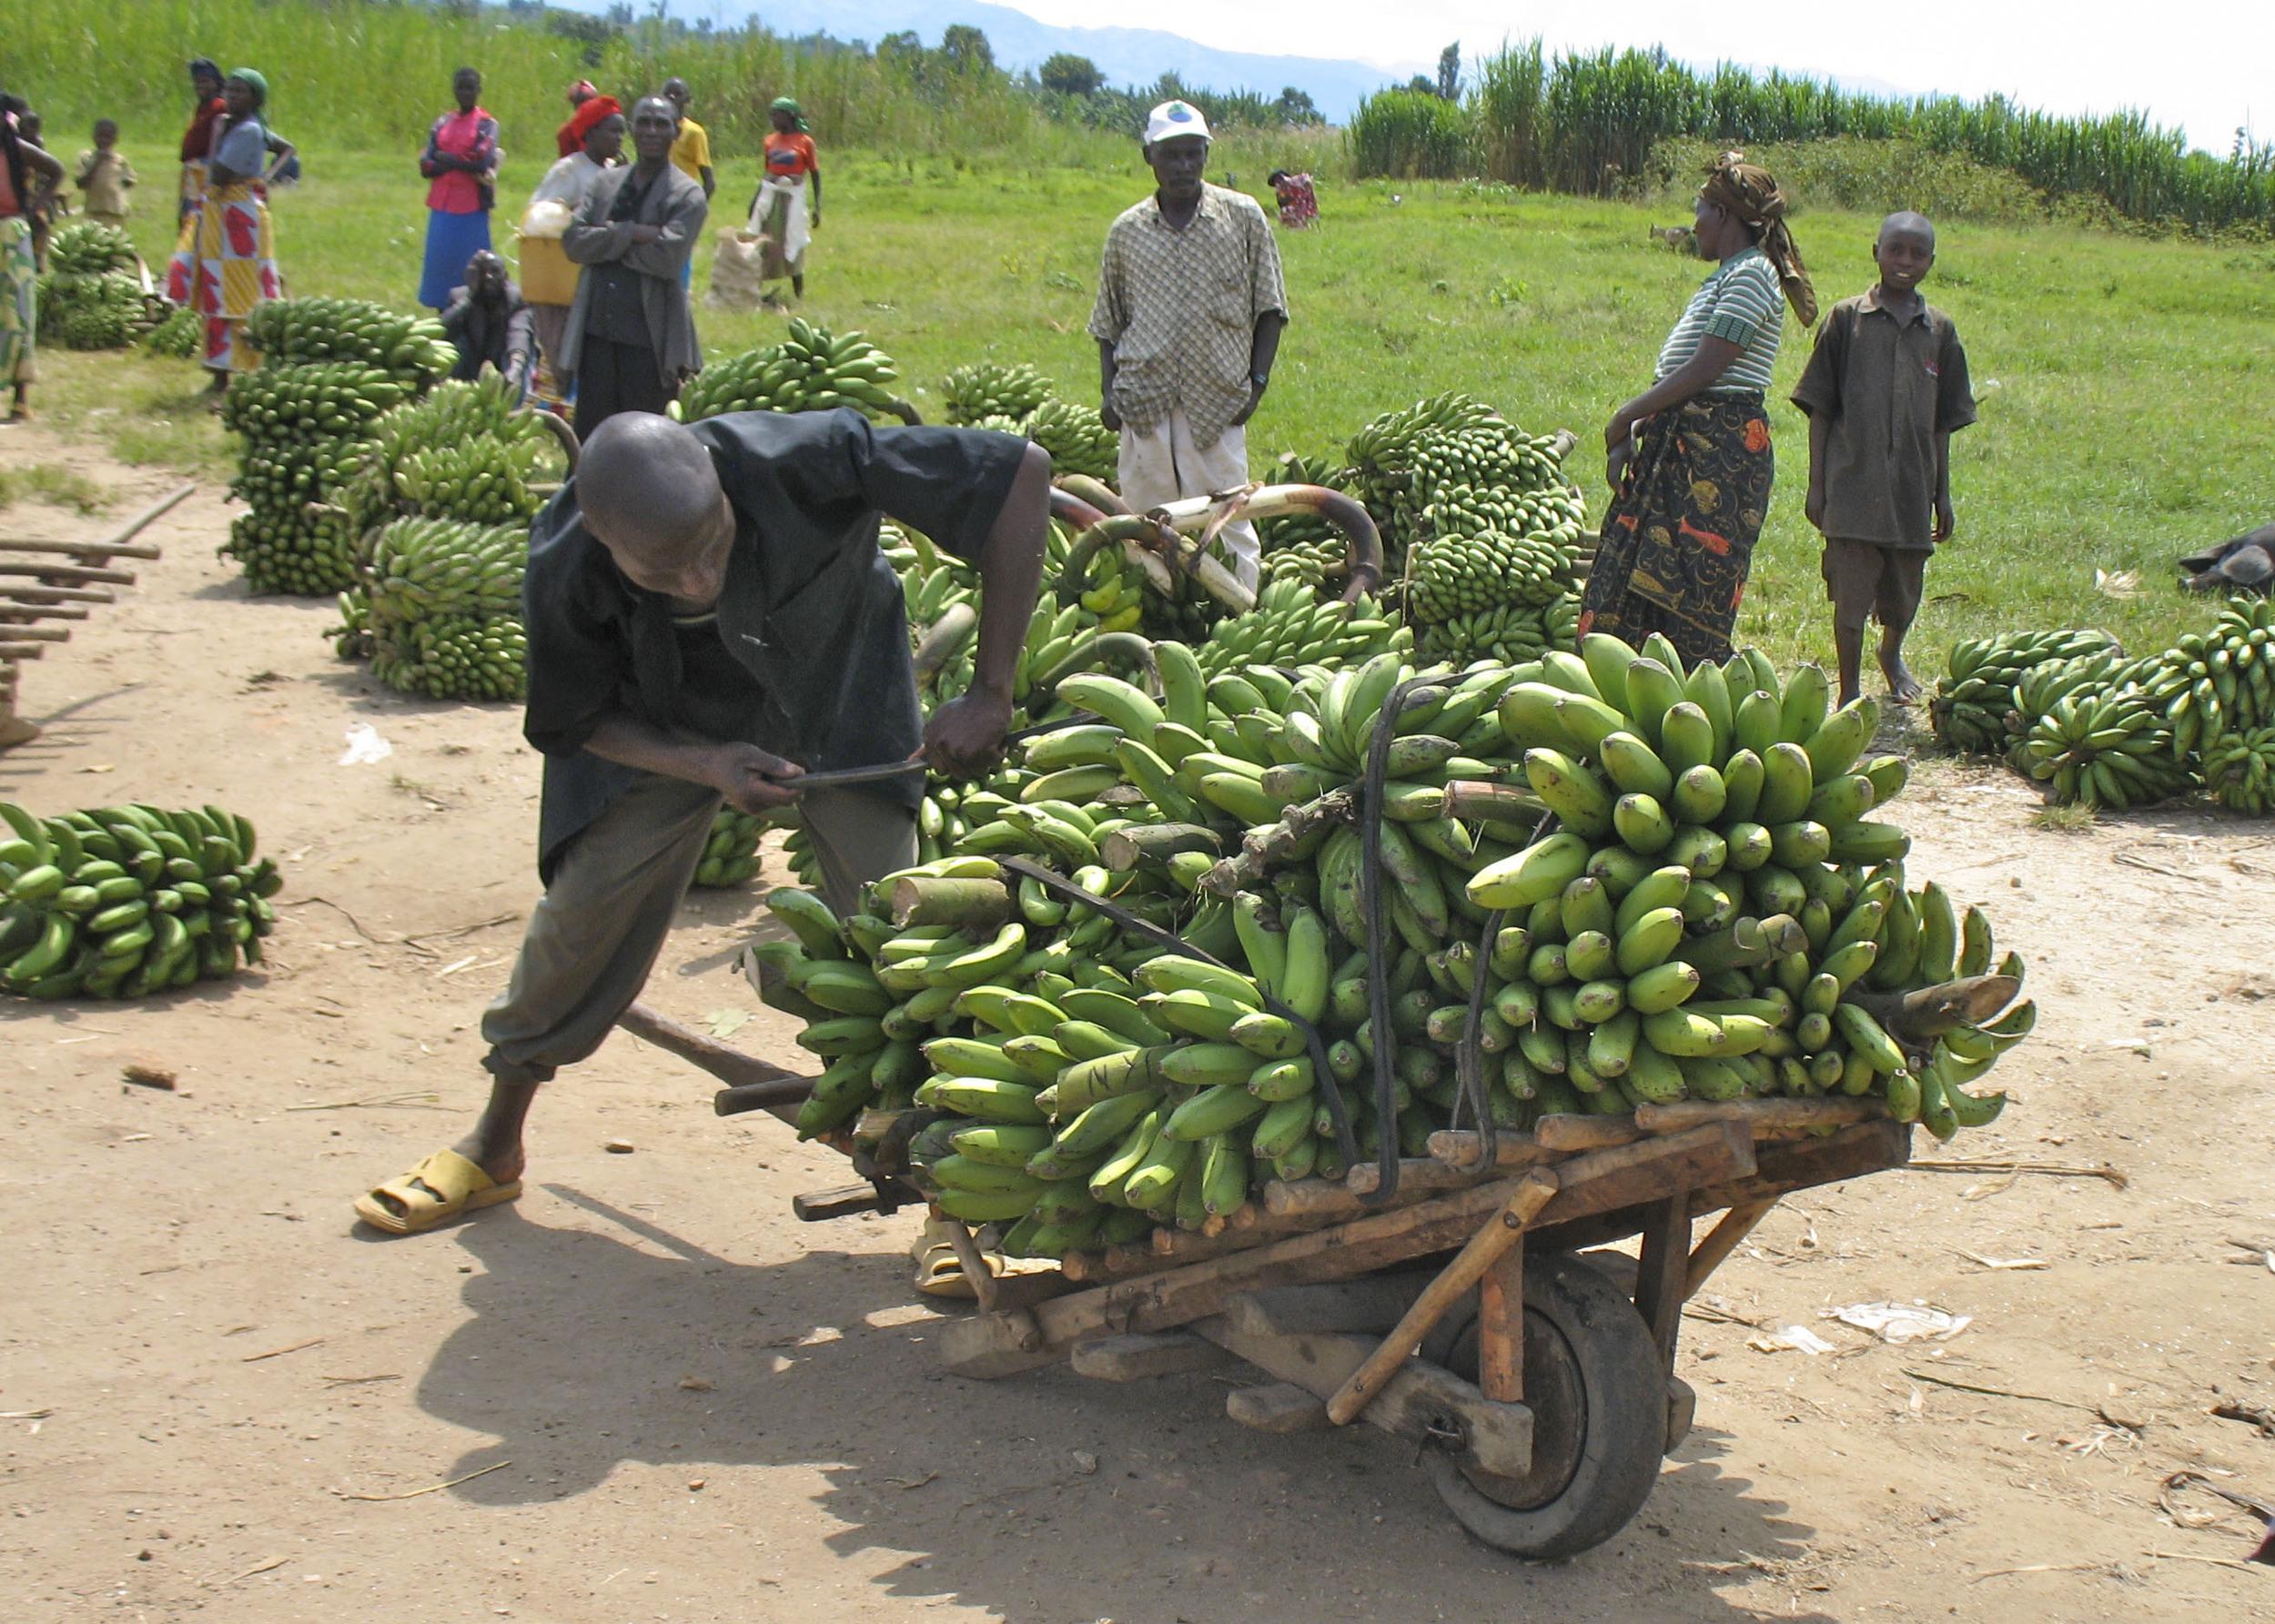 man with bananas on cart.jpg